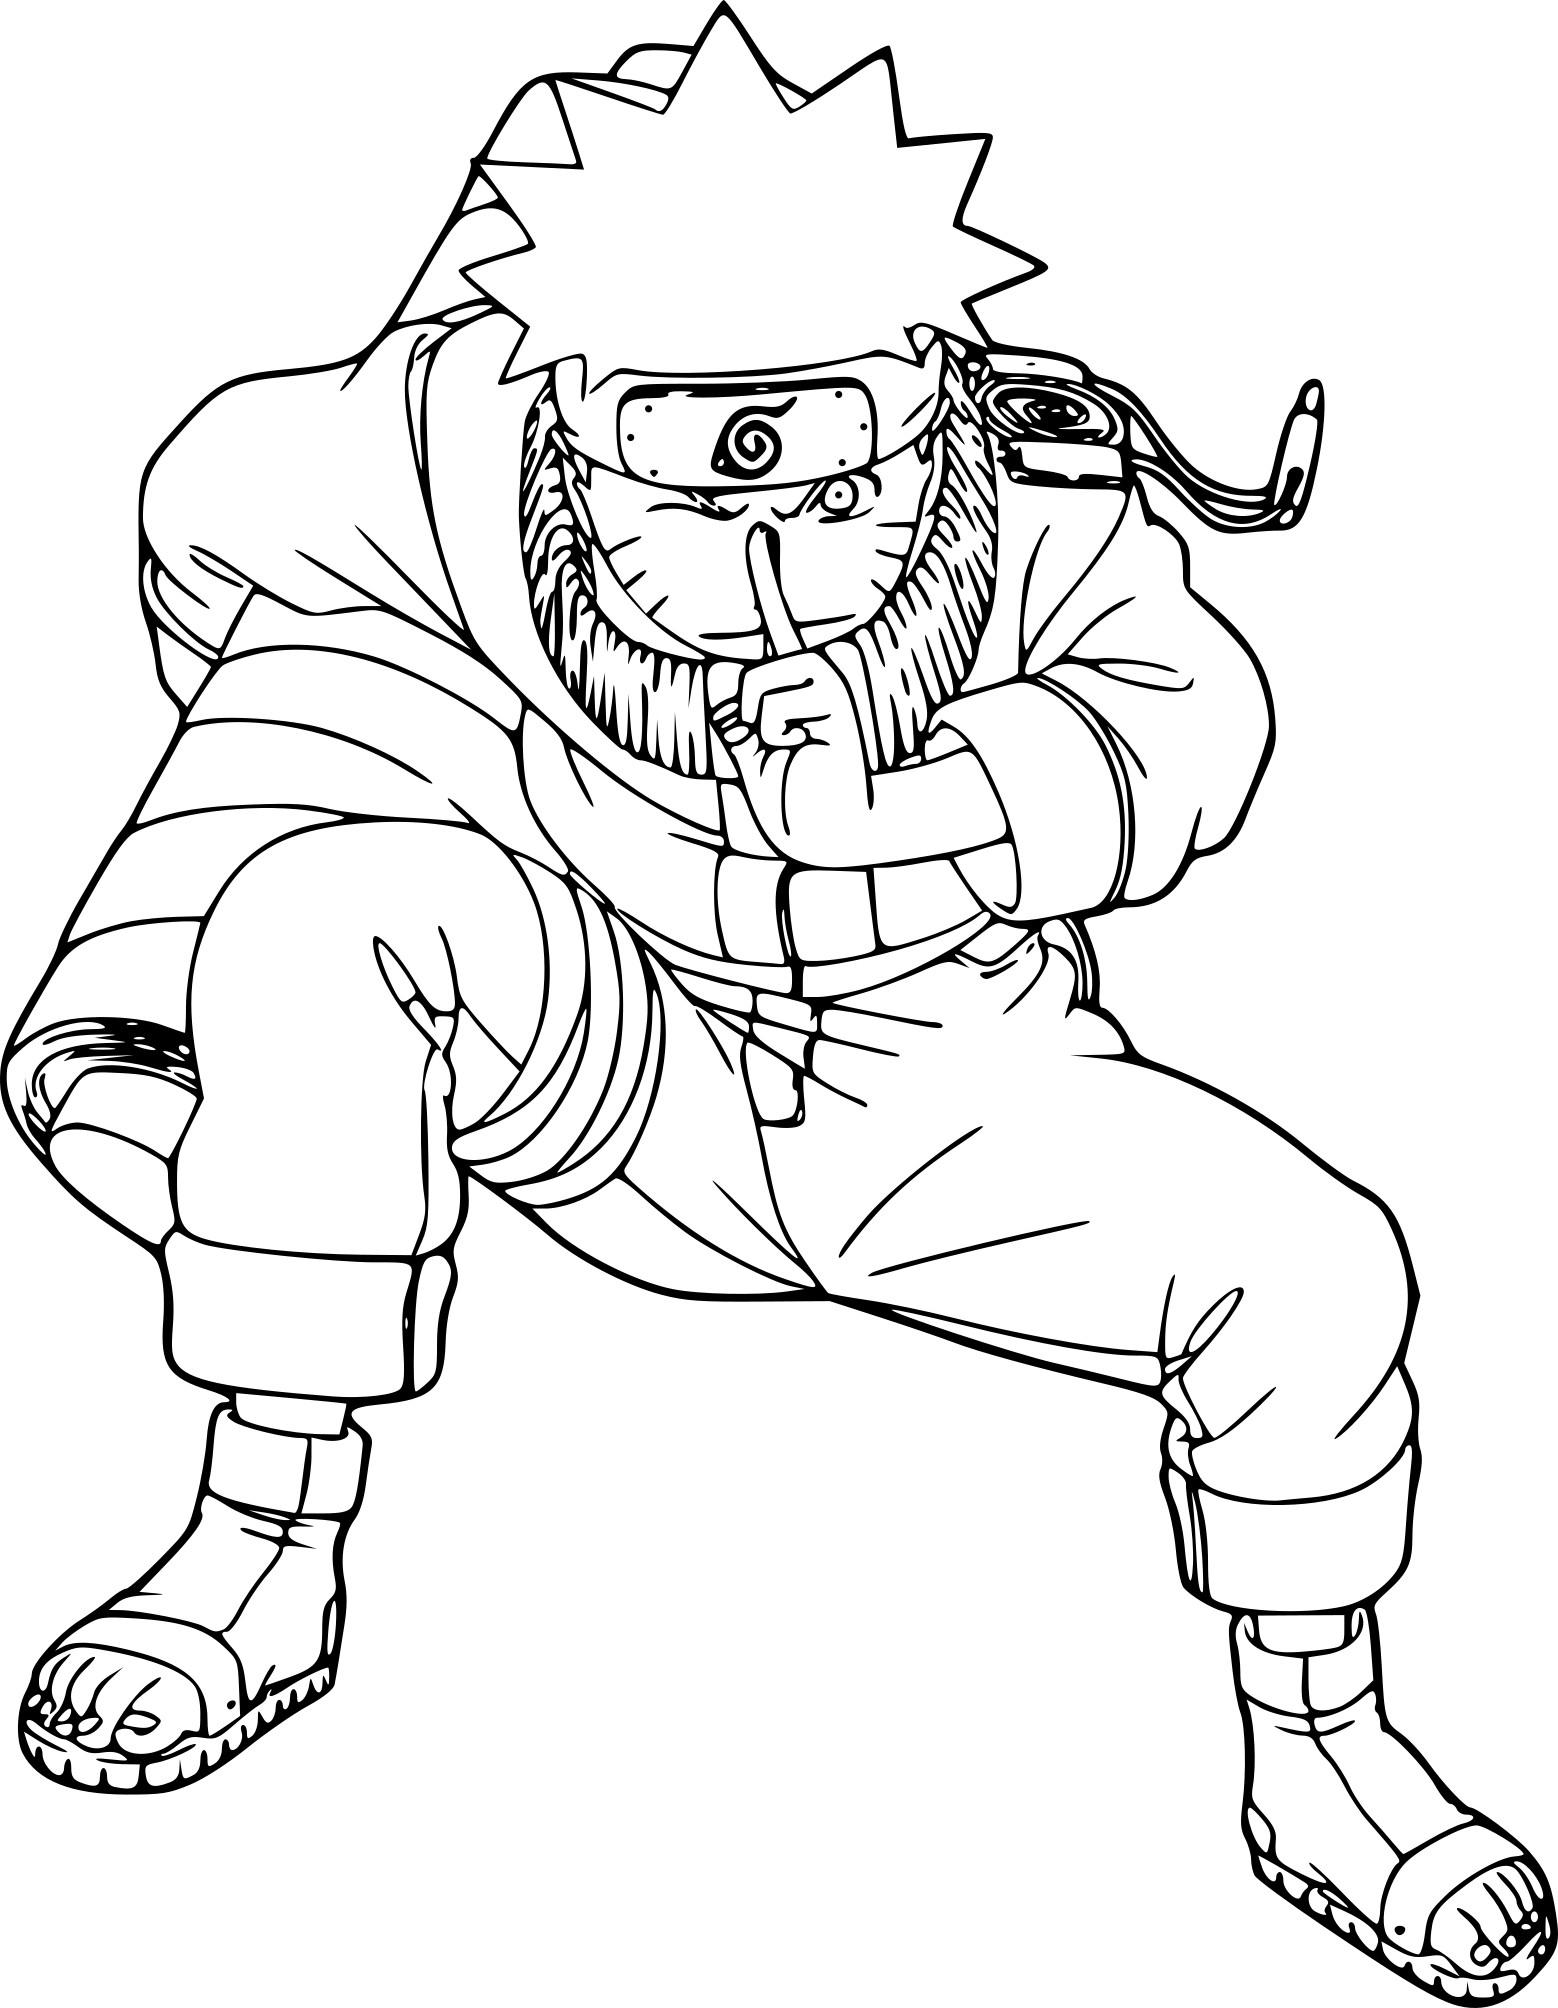 Coloriage Naruto Et Dessin À Imprimer serapportantà Coloriage Manga A Imprimer